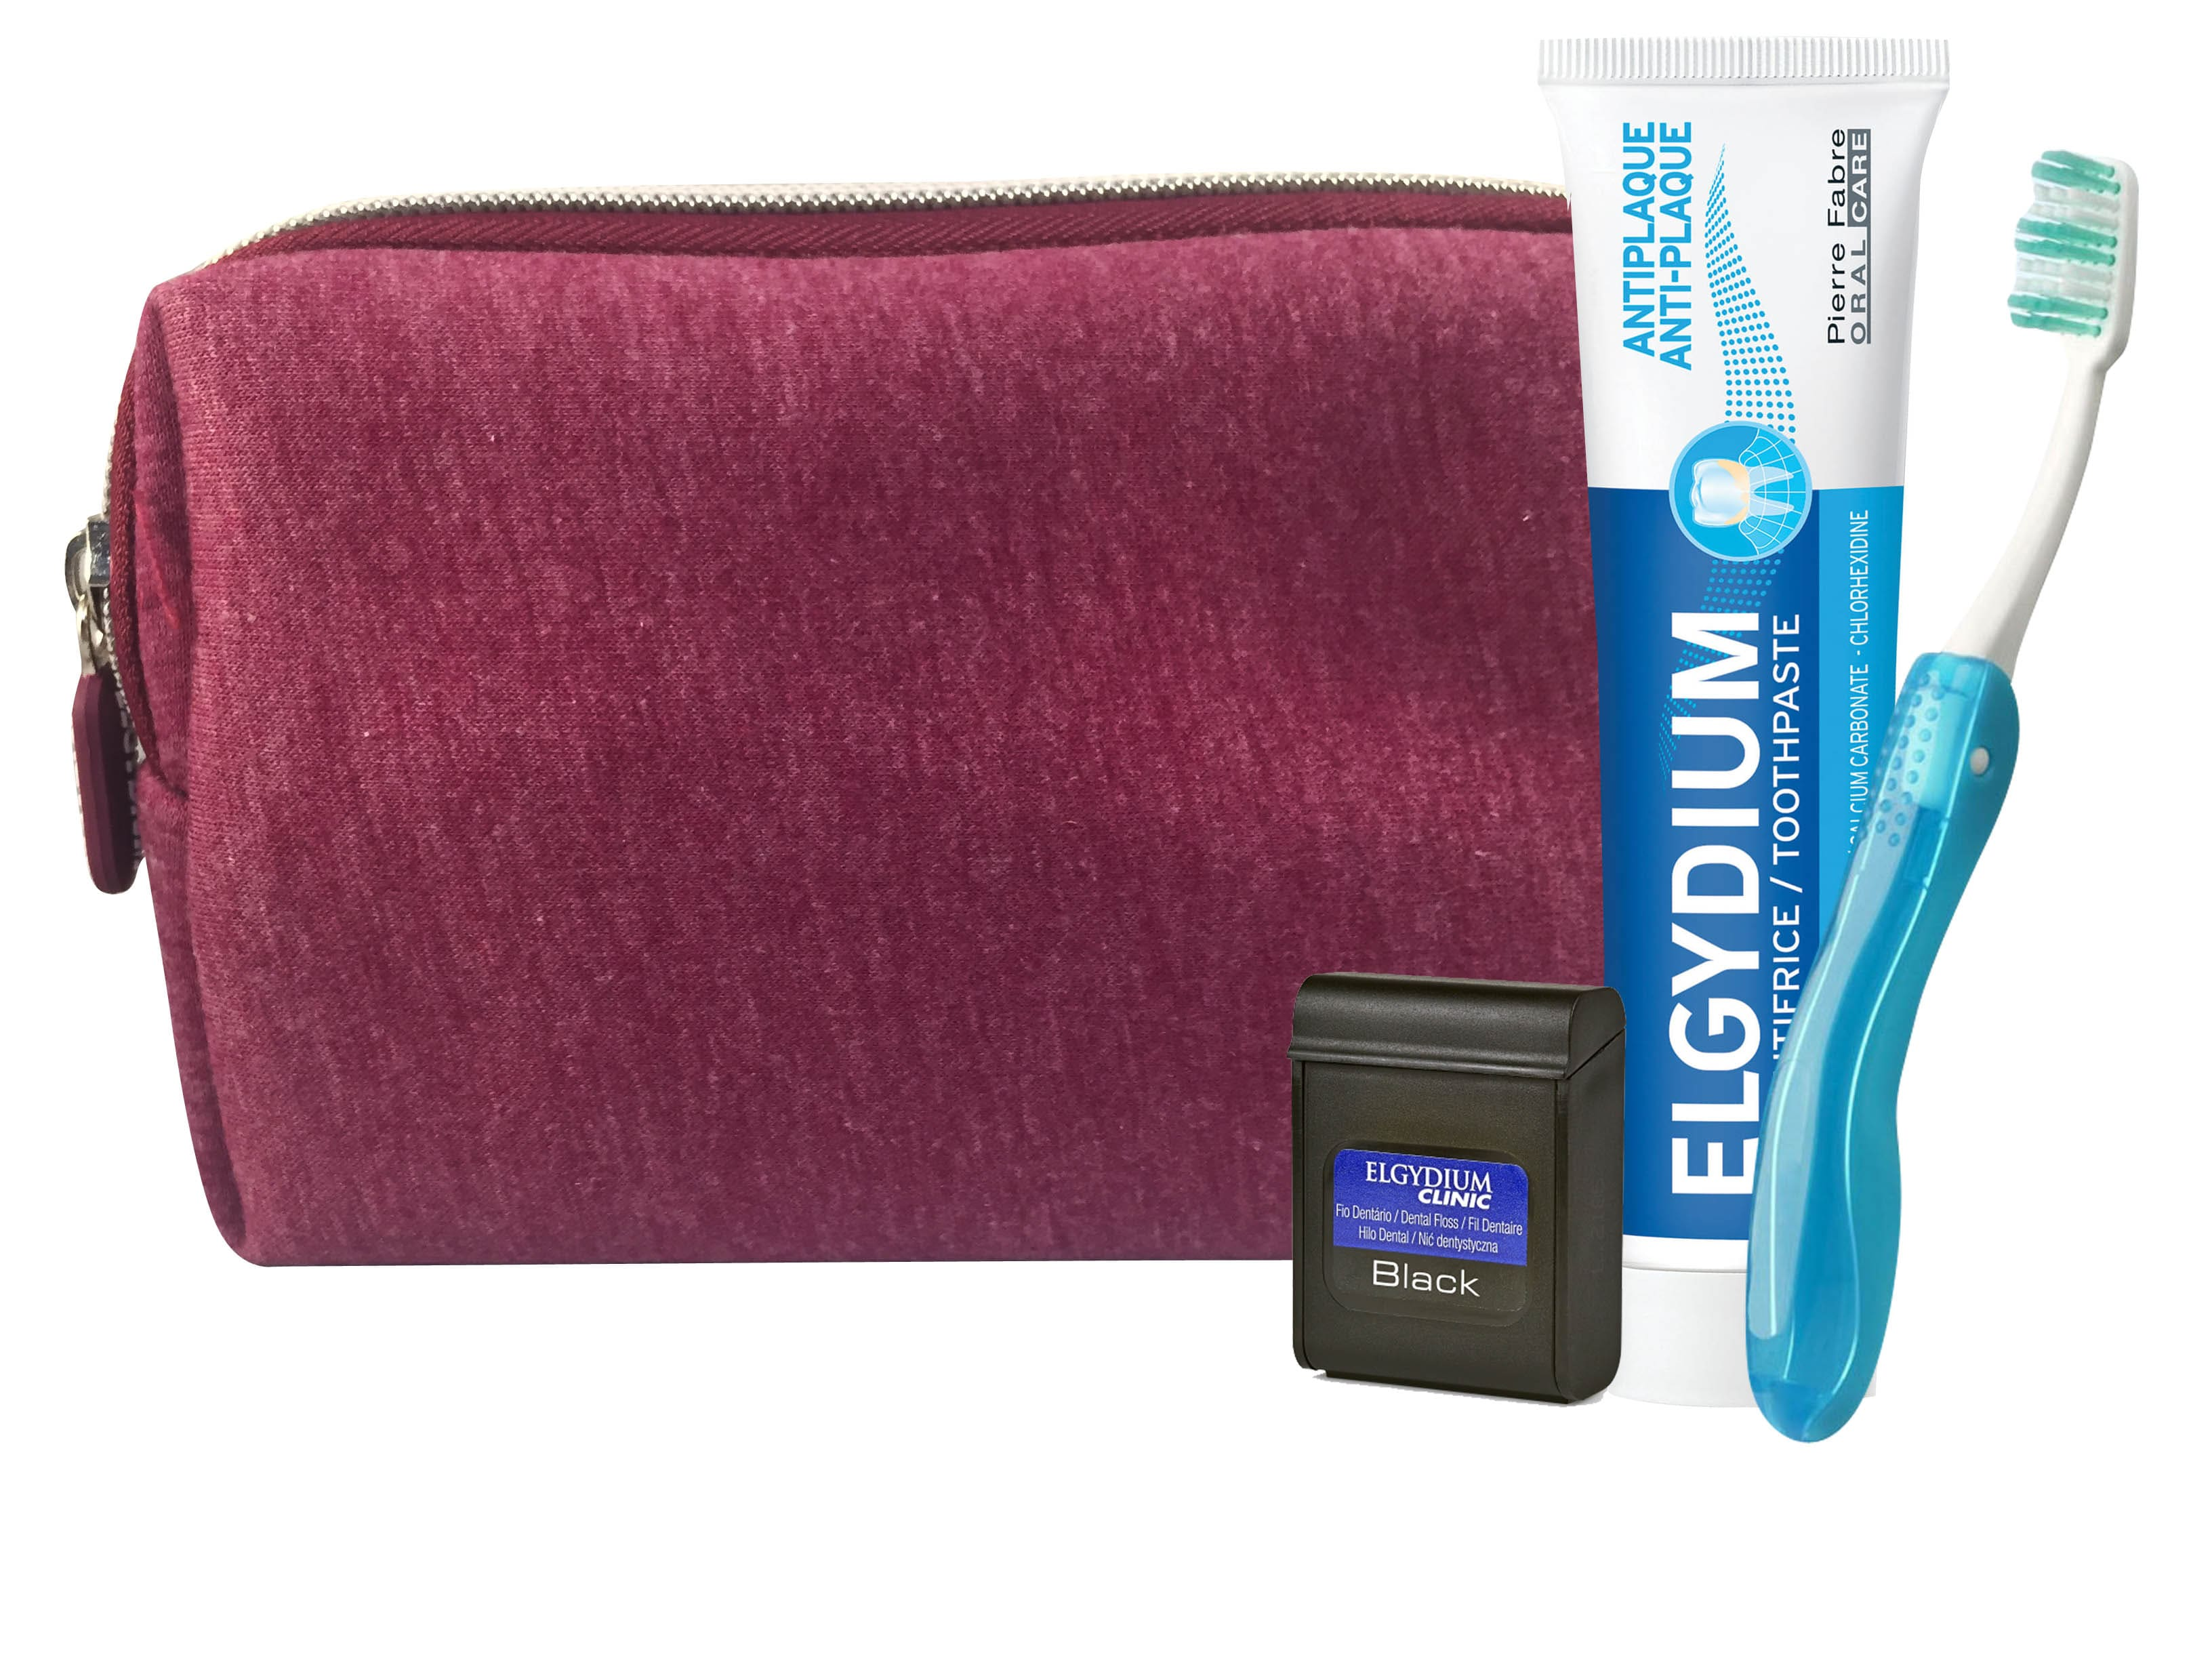 Elgydium Dental Travel Kit με Elgydium Pocket Οδοντόβουρτσα Ταξιδίου, 1 τεμάχιο, Antiplaque Οδοντόκρεμα κατά της πλάκας, 50ml & Dental Floss Black Οδοντικό Νήμα με Μαύρο Χρώμα, 5m σε μπορντό τσαντάκι μεταφοράς